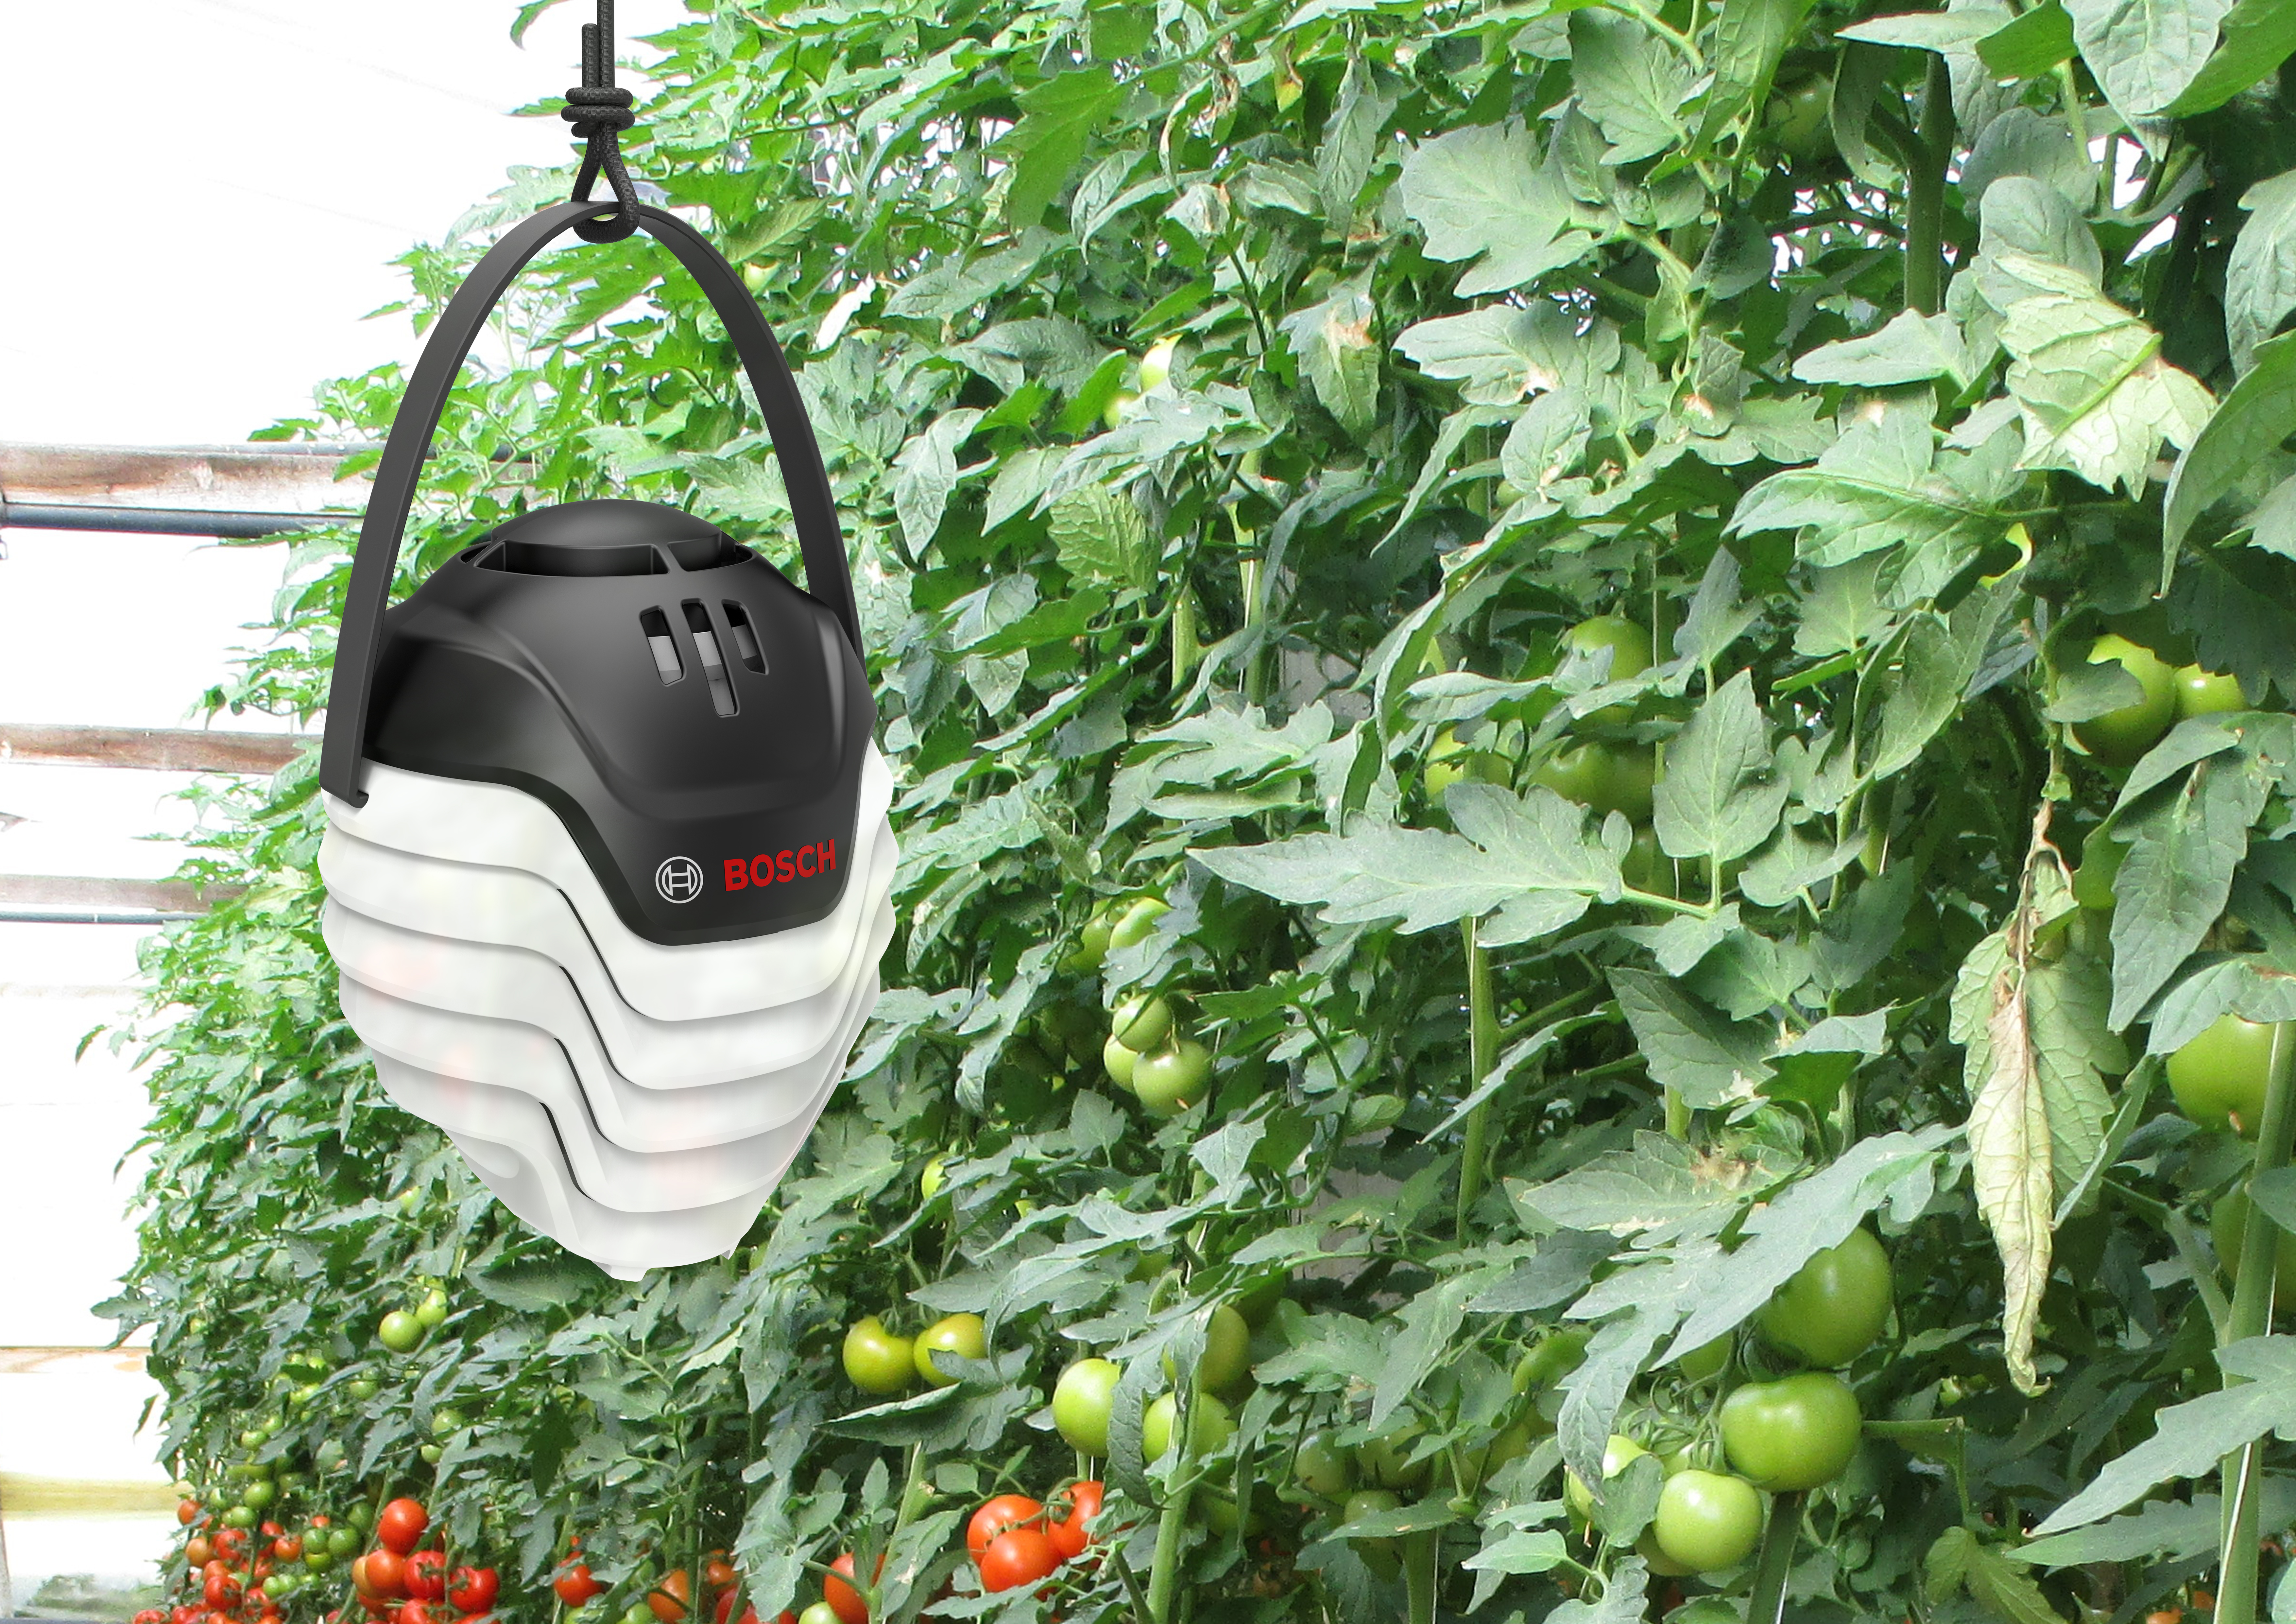 Plantect guarantees healthy tomatoes